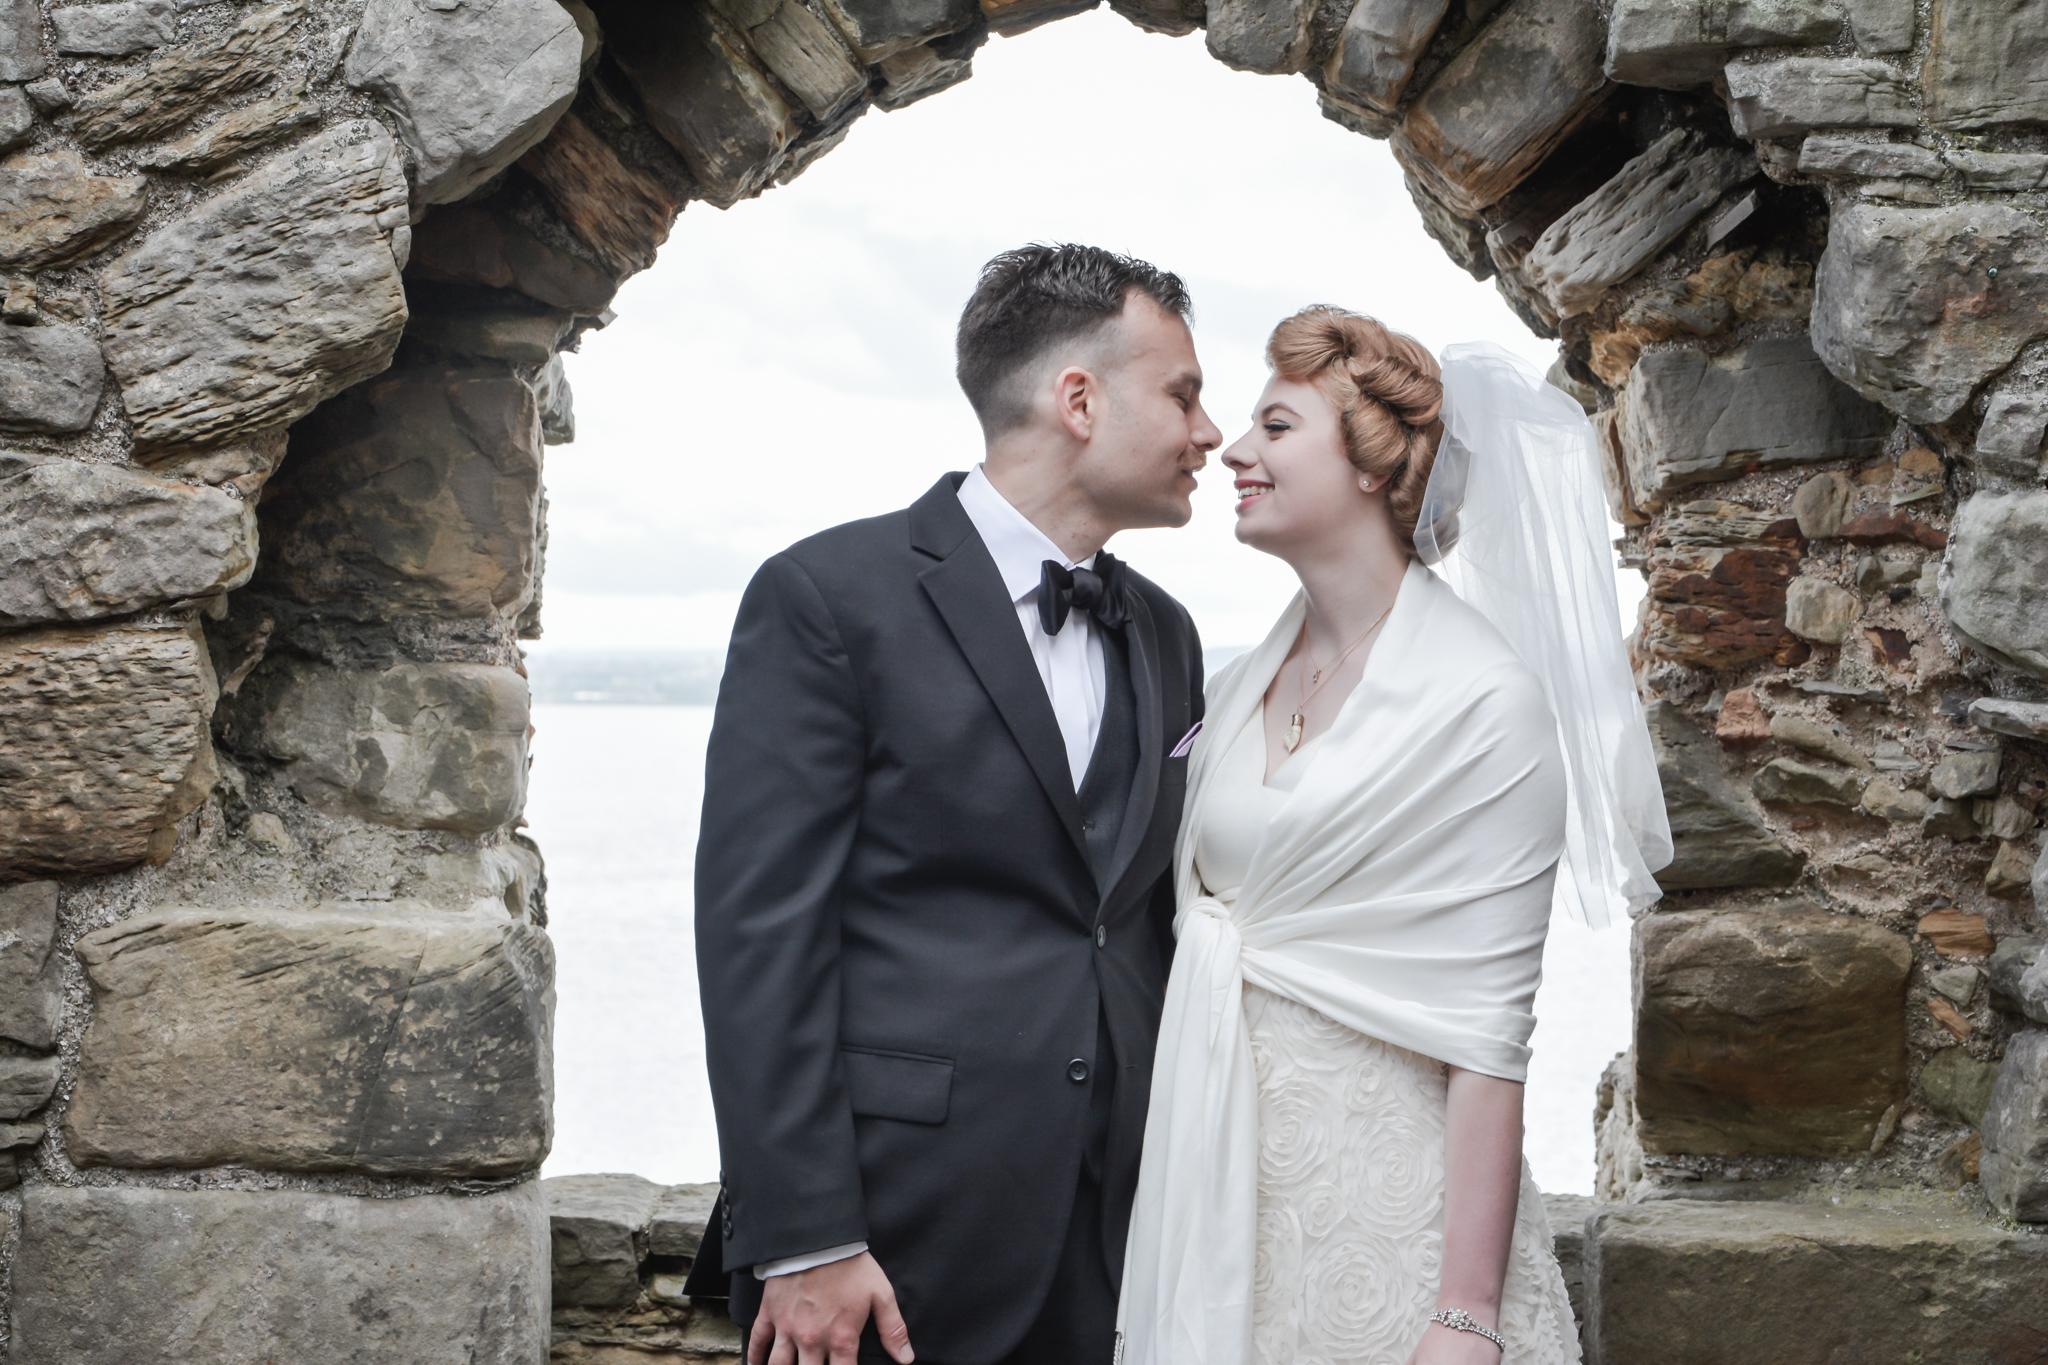 Agnostic Scotland Wedding Celebrant, Onie Tibbitt, conducting a beautiful and personal Wedding Ceremony on Inchcolm Island.